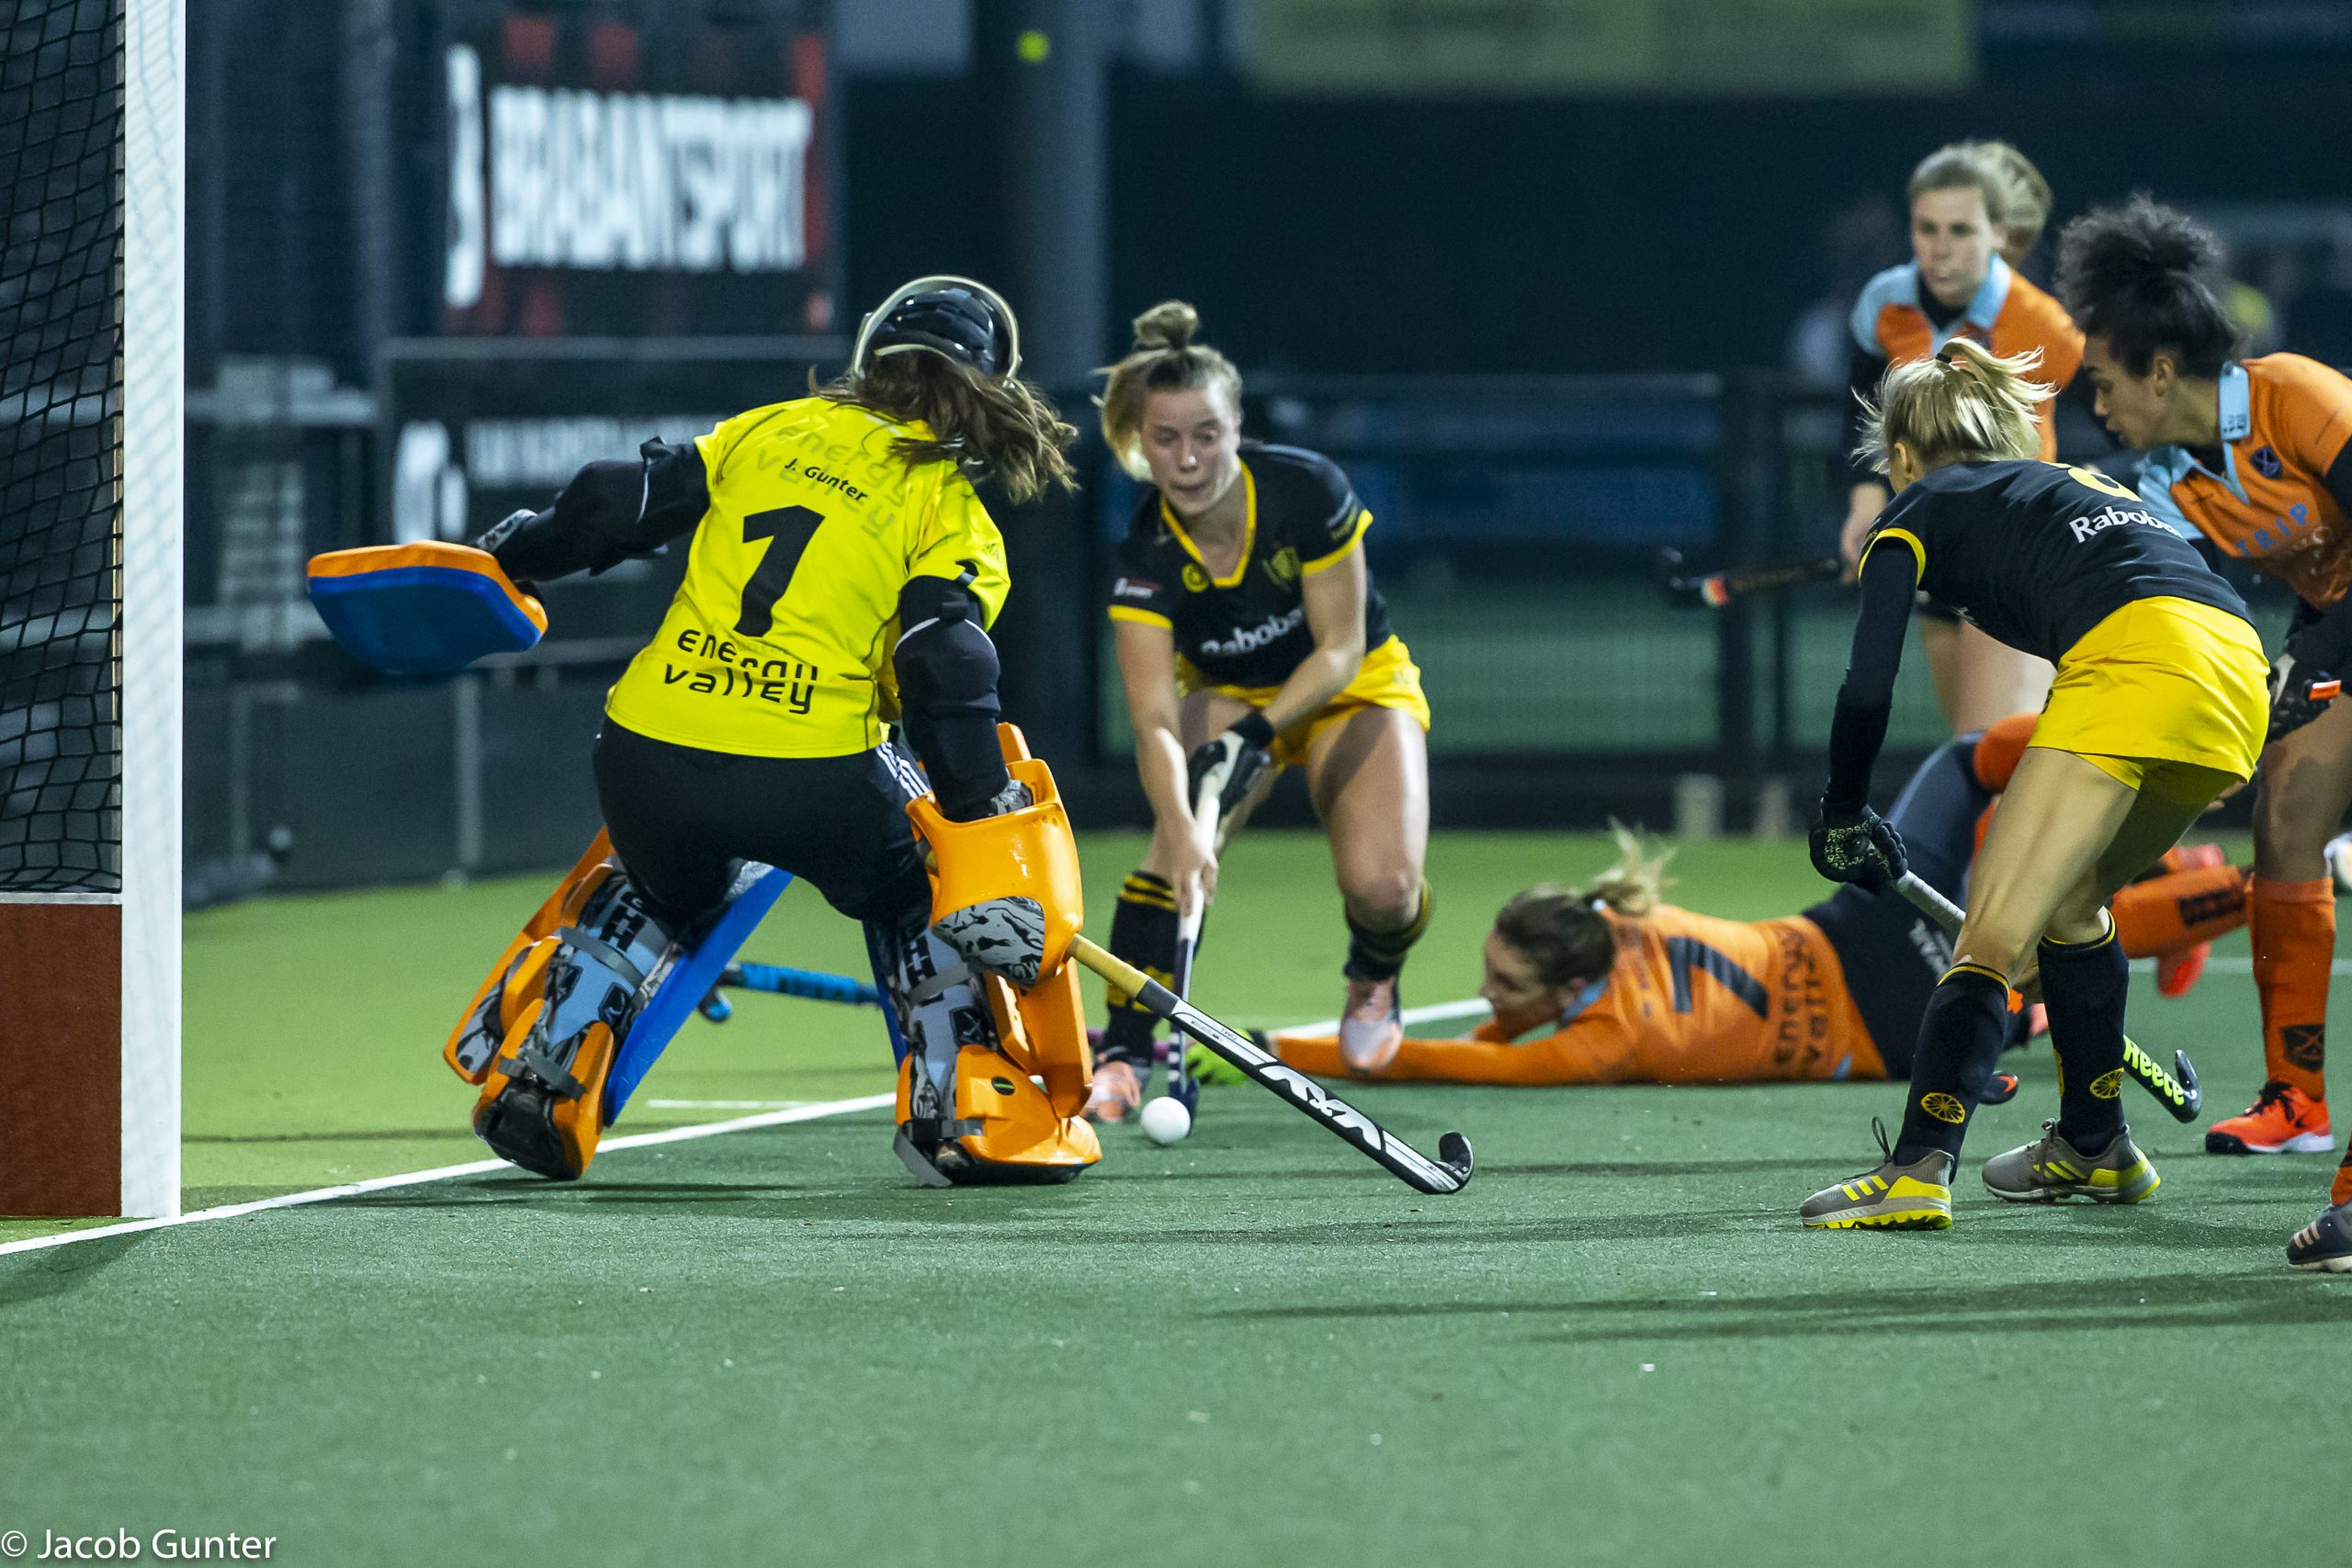 Round-up Livera Hoofdklasse (D): Amsterdam en SCHC scoren er op los, gehele top vier foutloos